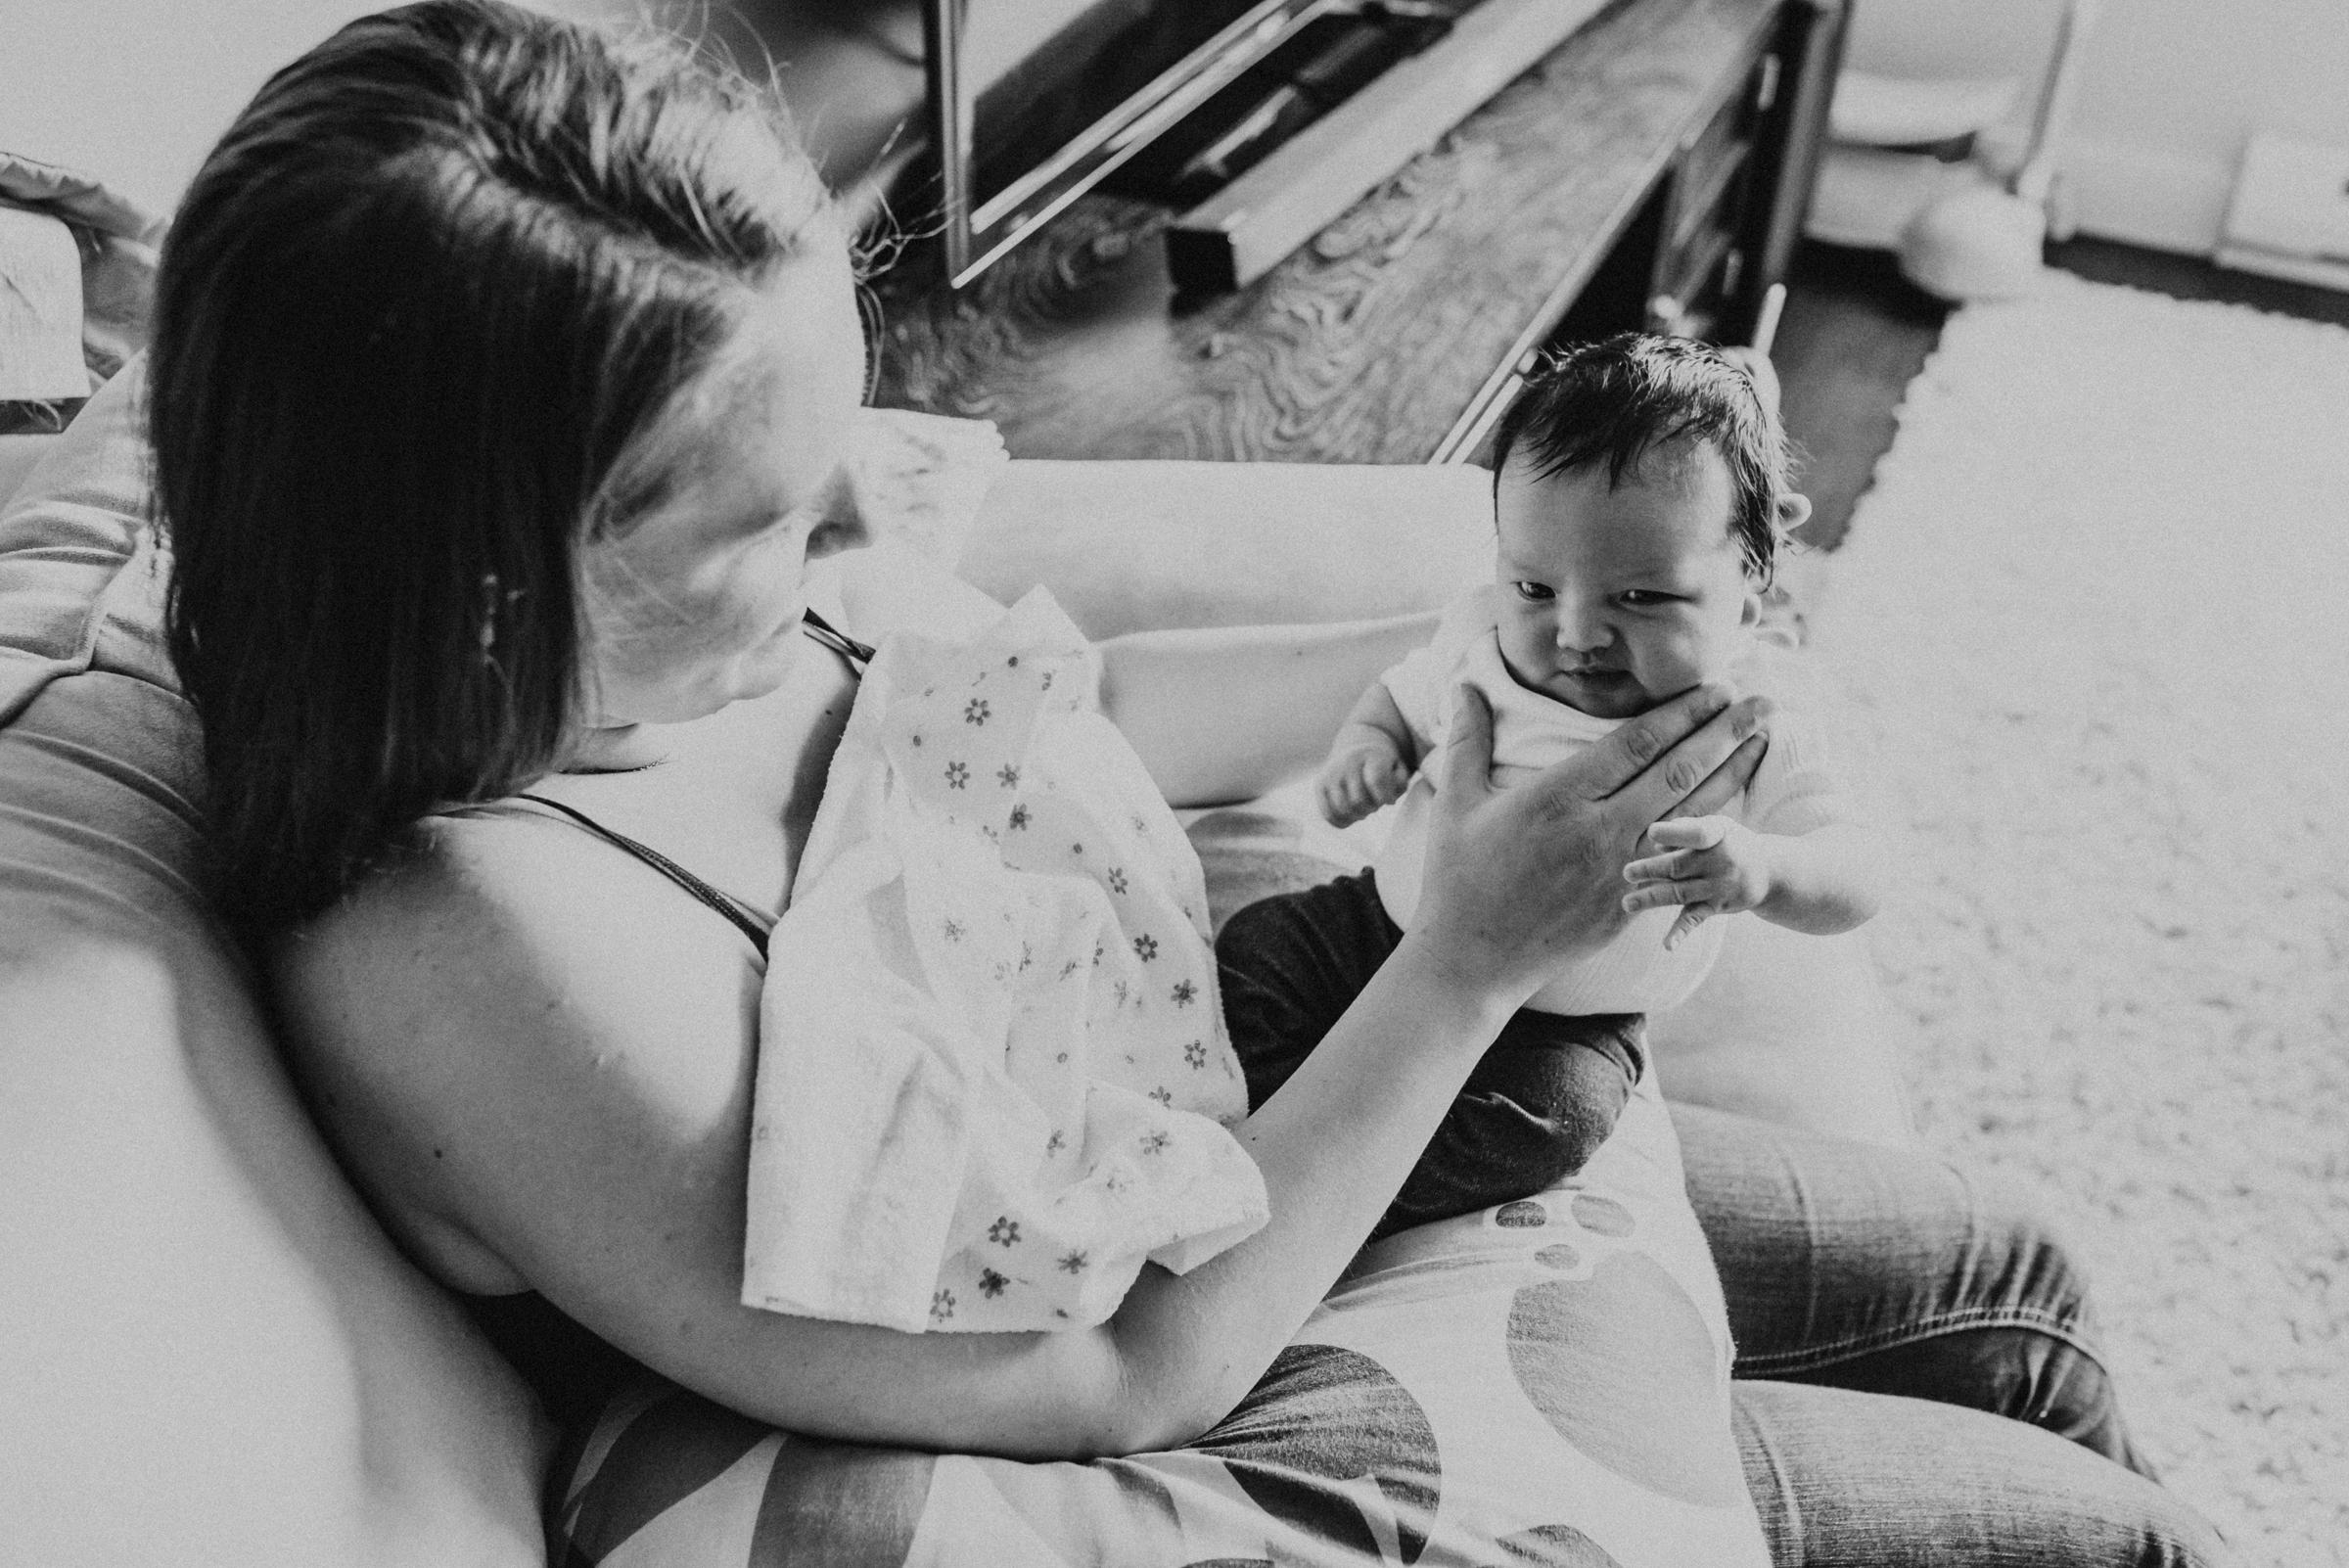 Nicola_Reiersen_Photography_Victoria_BC_Family_Photographer-9.jpg